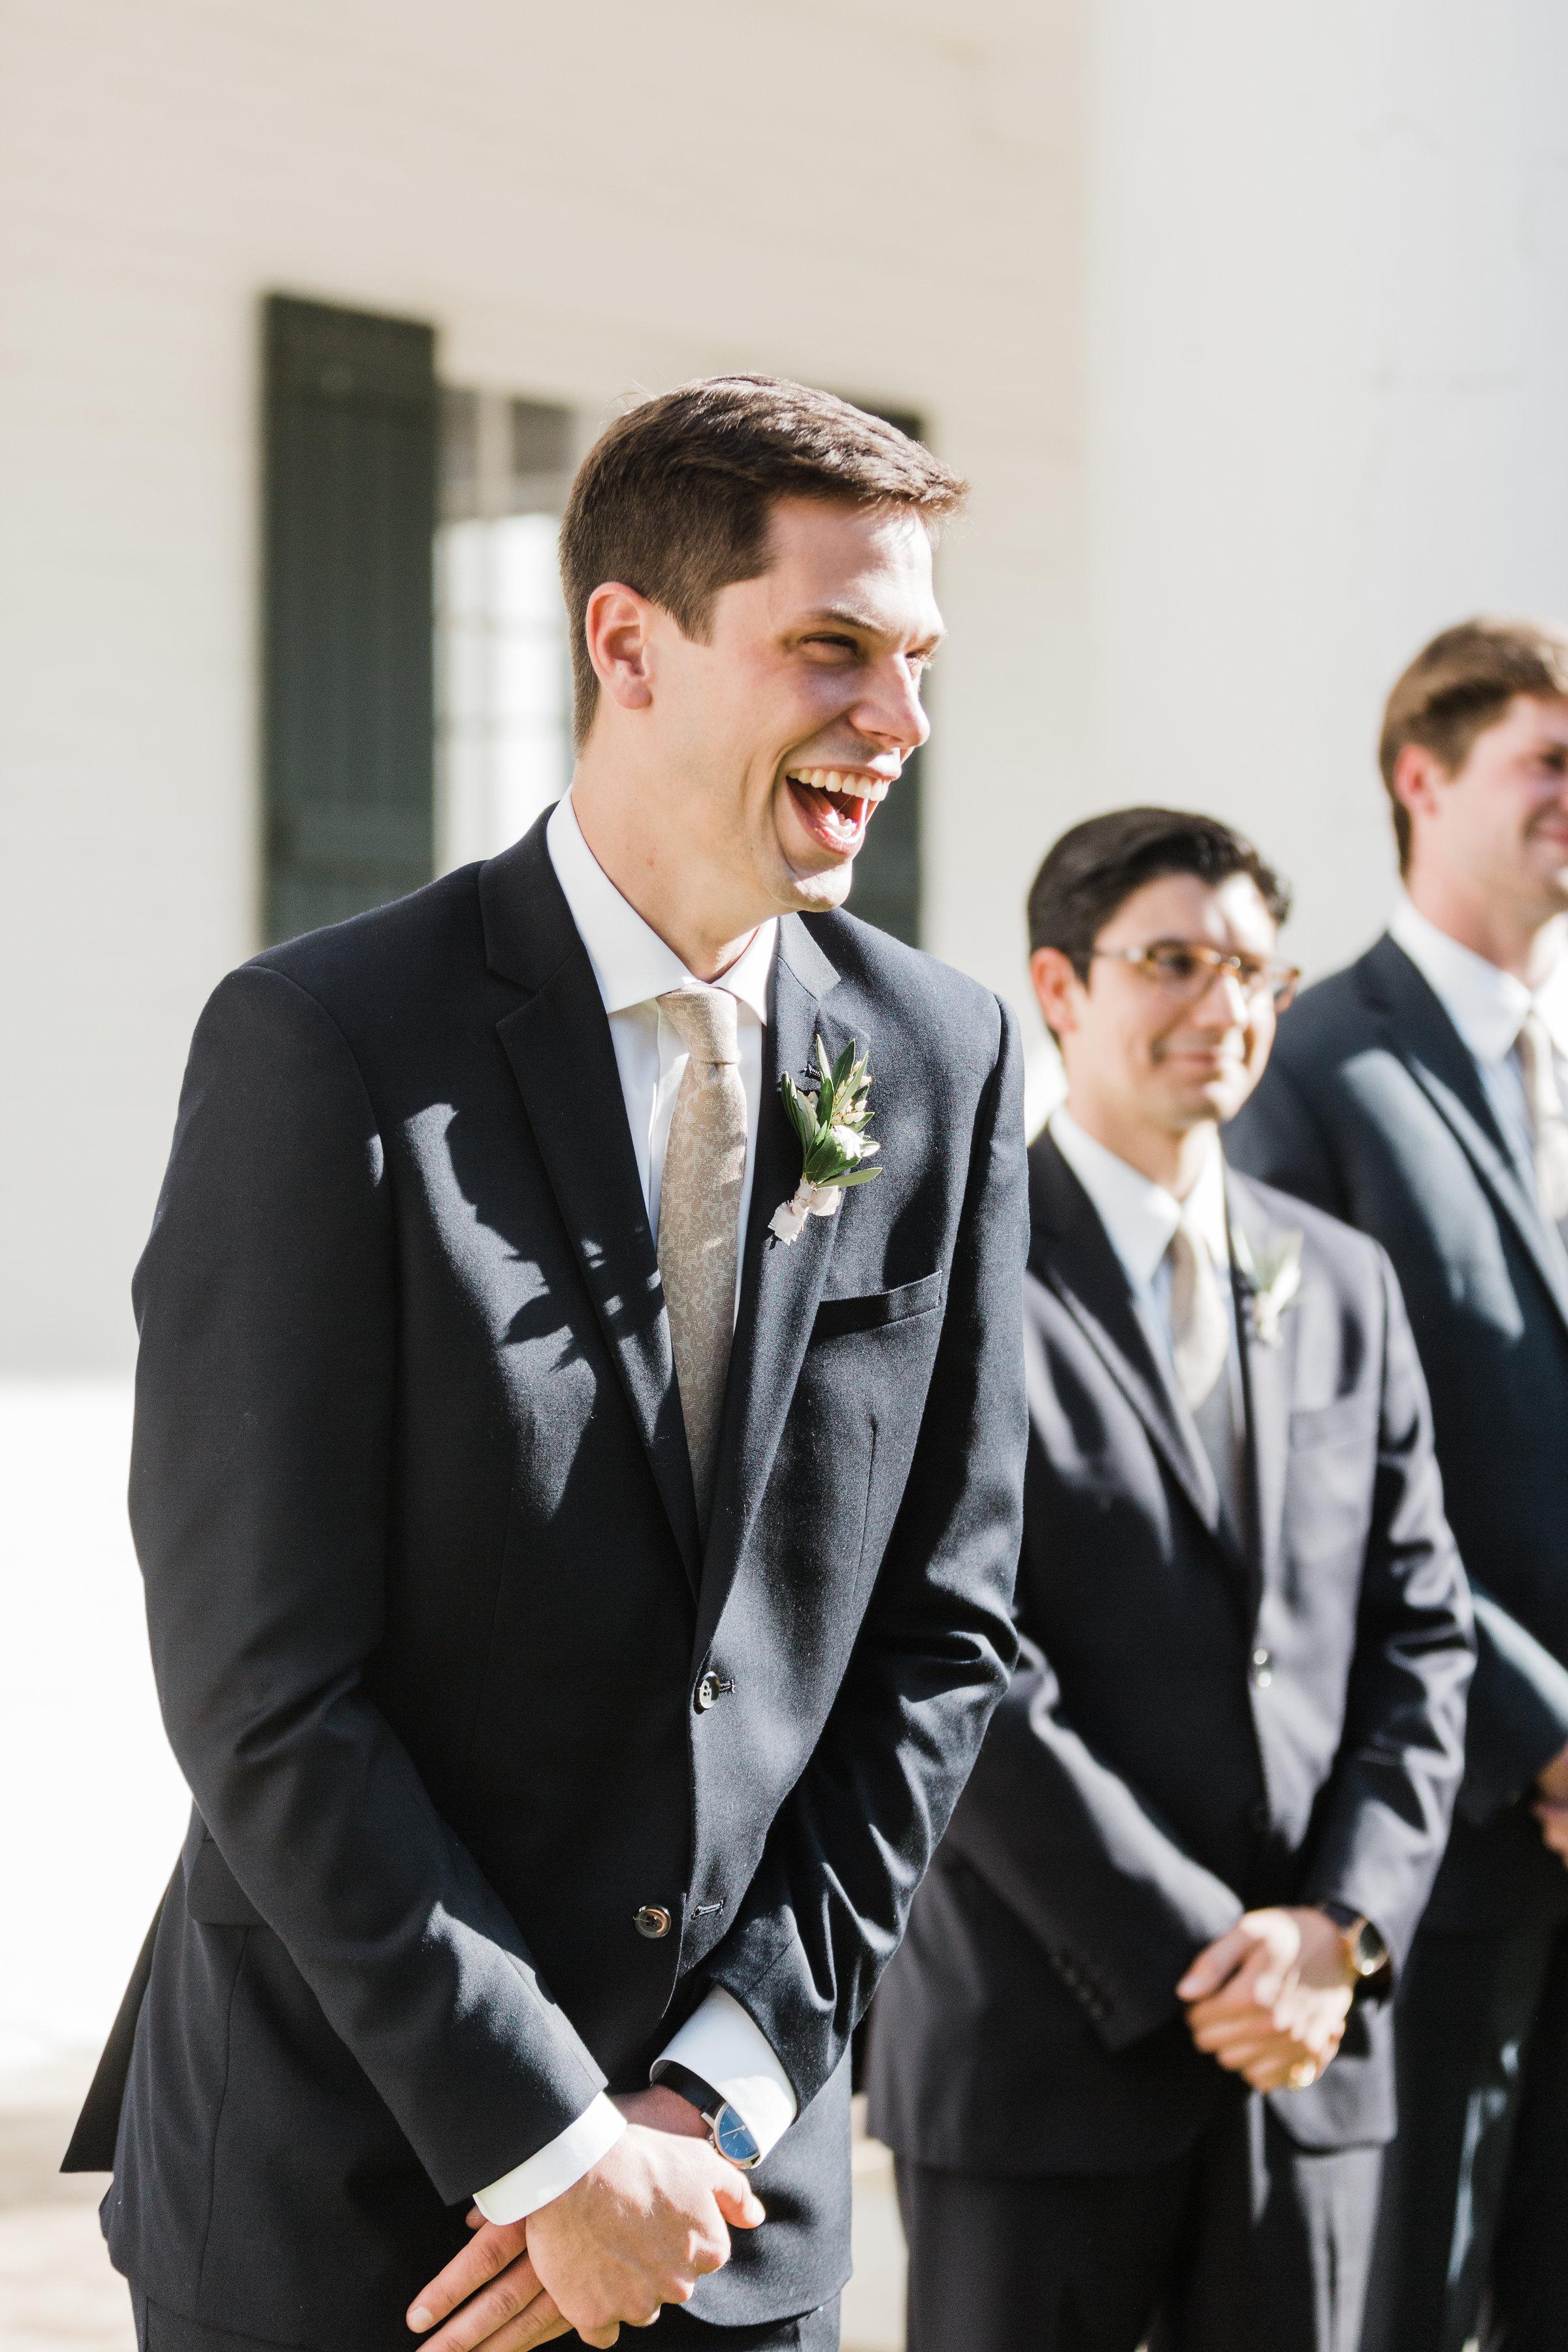 Southern Fete, Southern Wedding, Groom laughing, Carolynn Seibert Photography